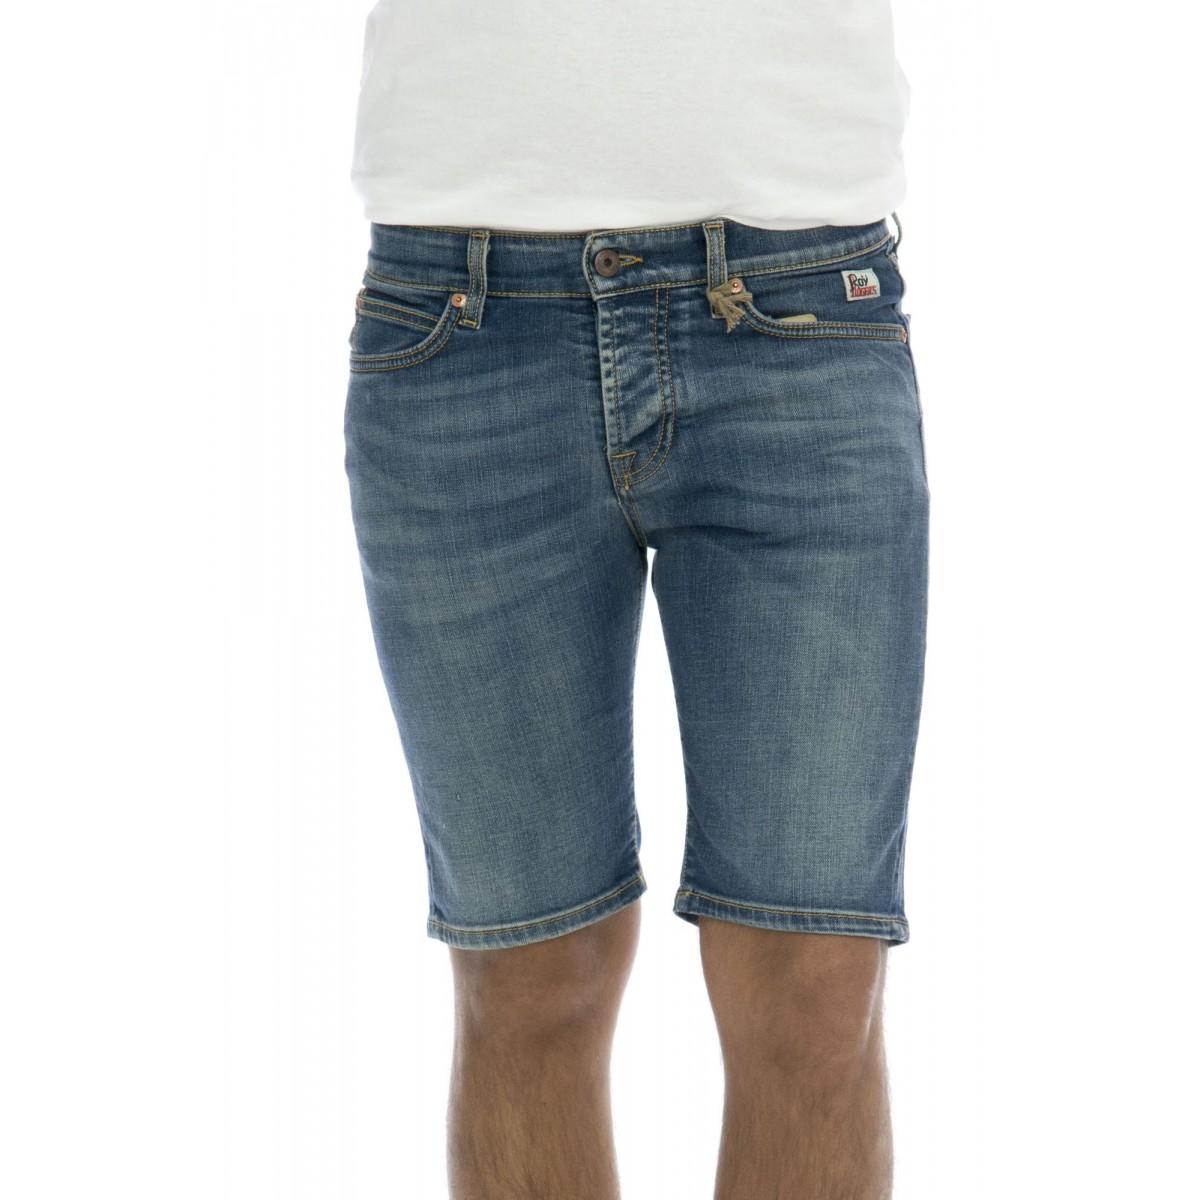 Bermuda uomo - Ber529 weared 10